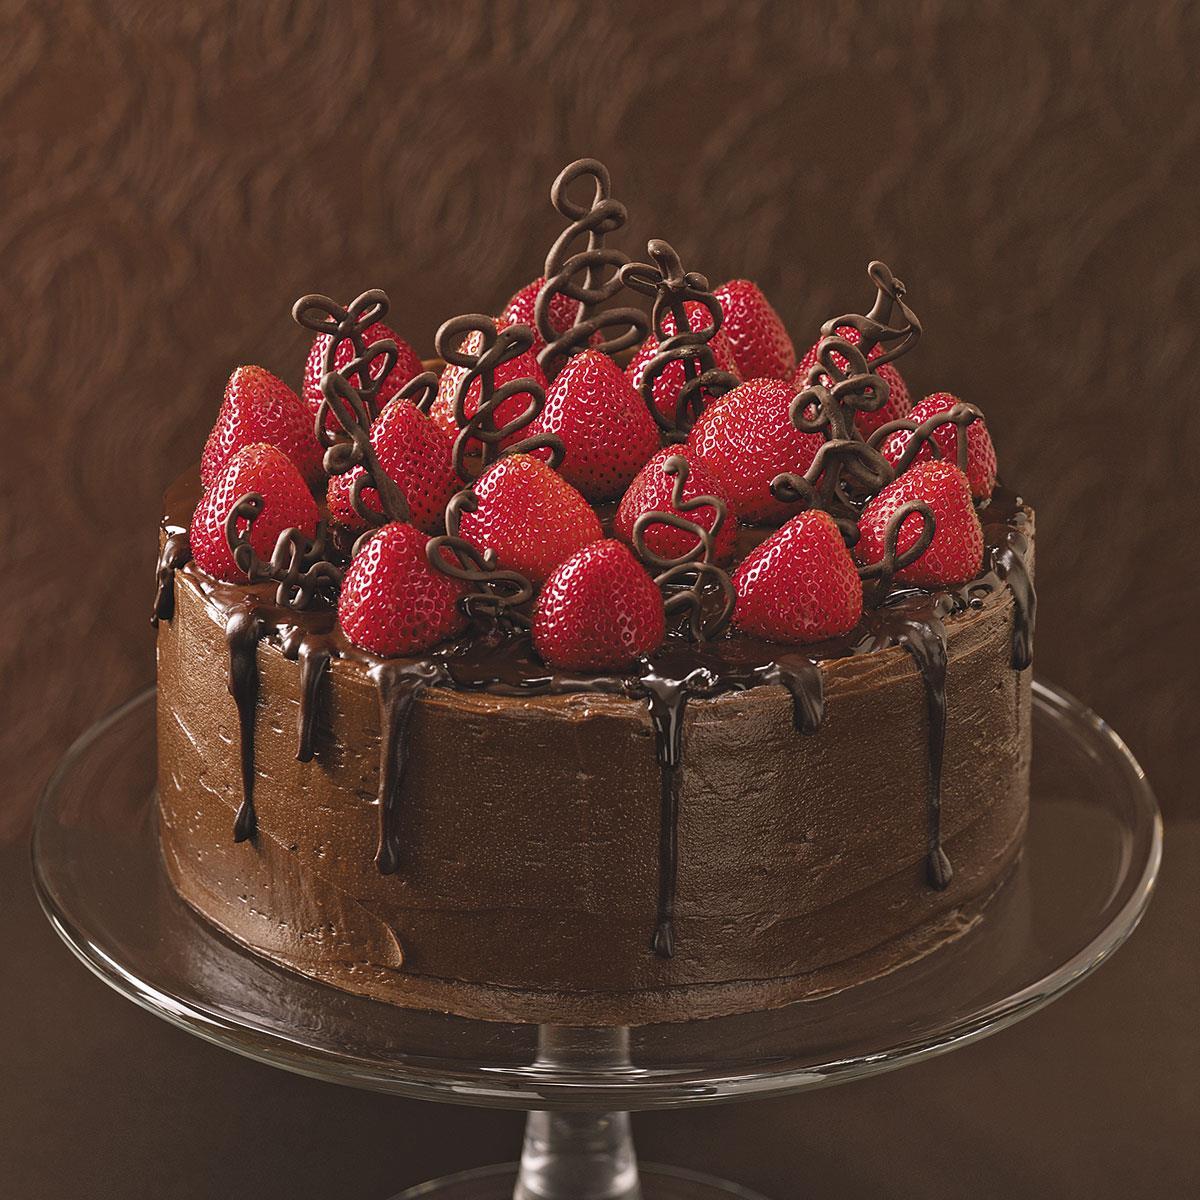 Chocolate Strawberry Celebration Cake Recipe